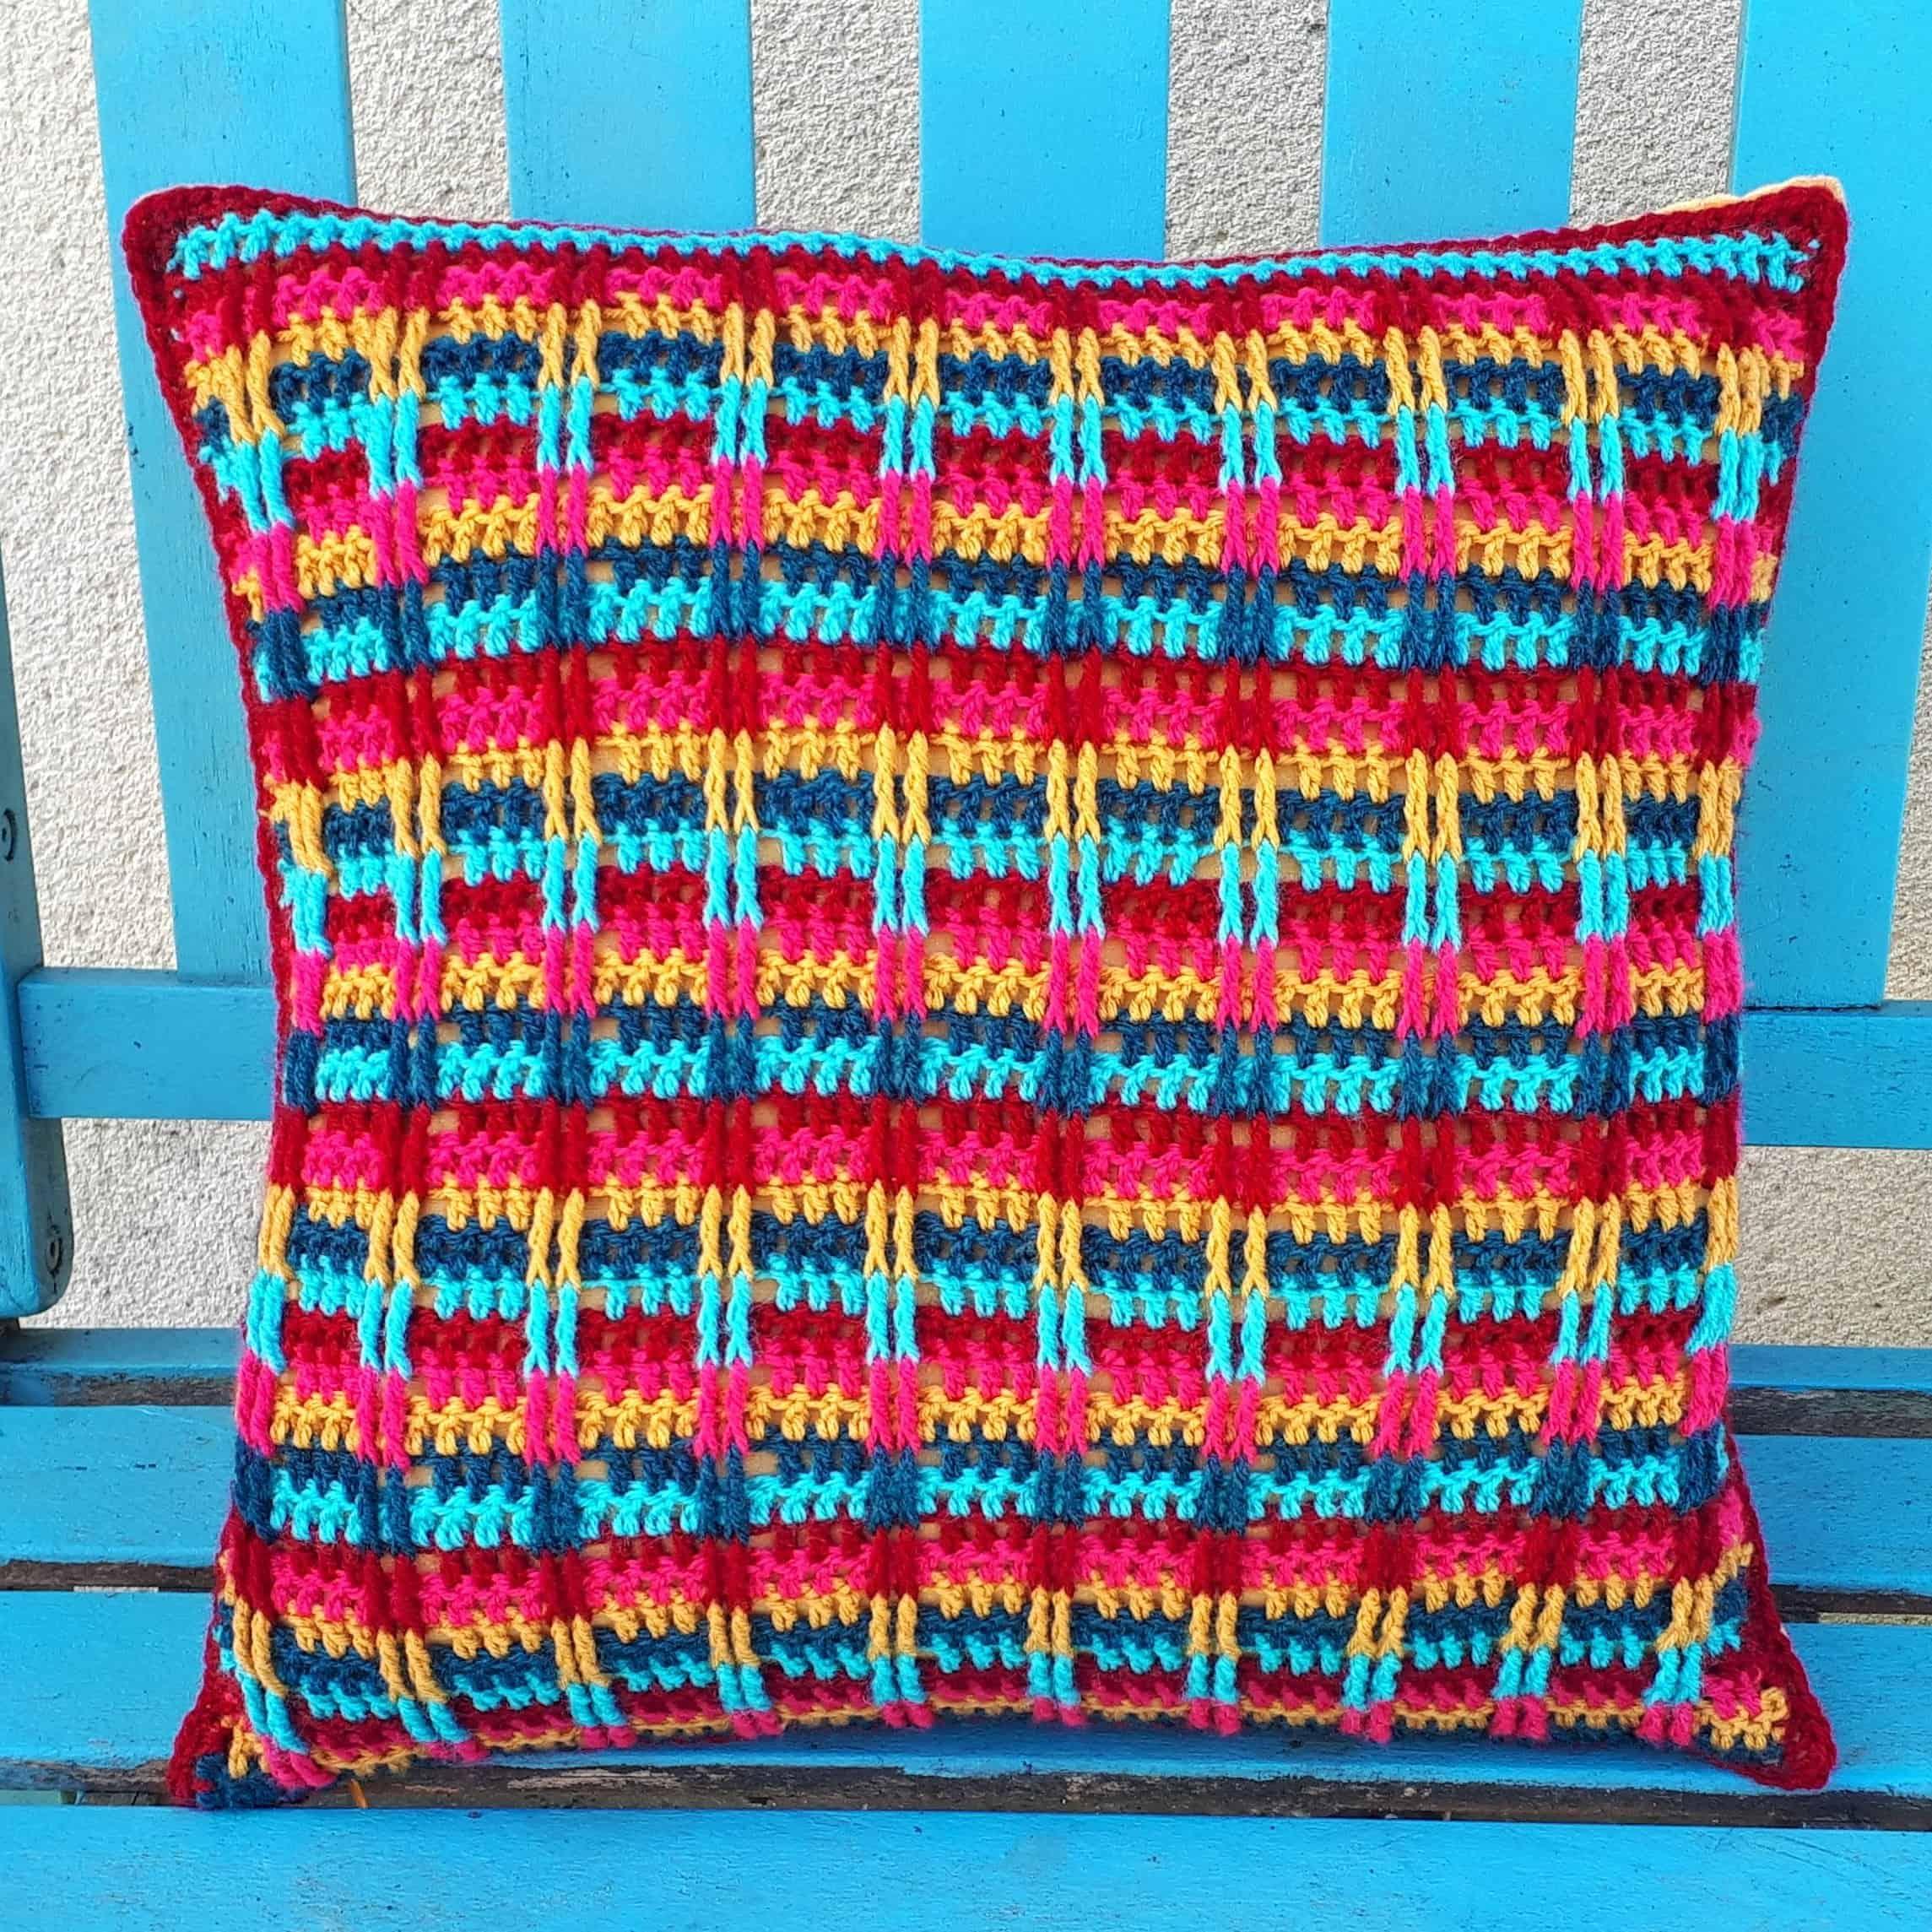 boho crochet pillow, free pattern from Annie Design Crochet